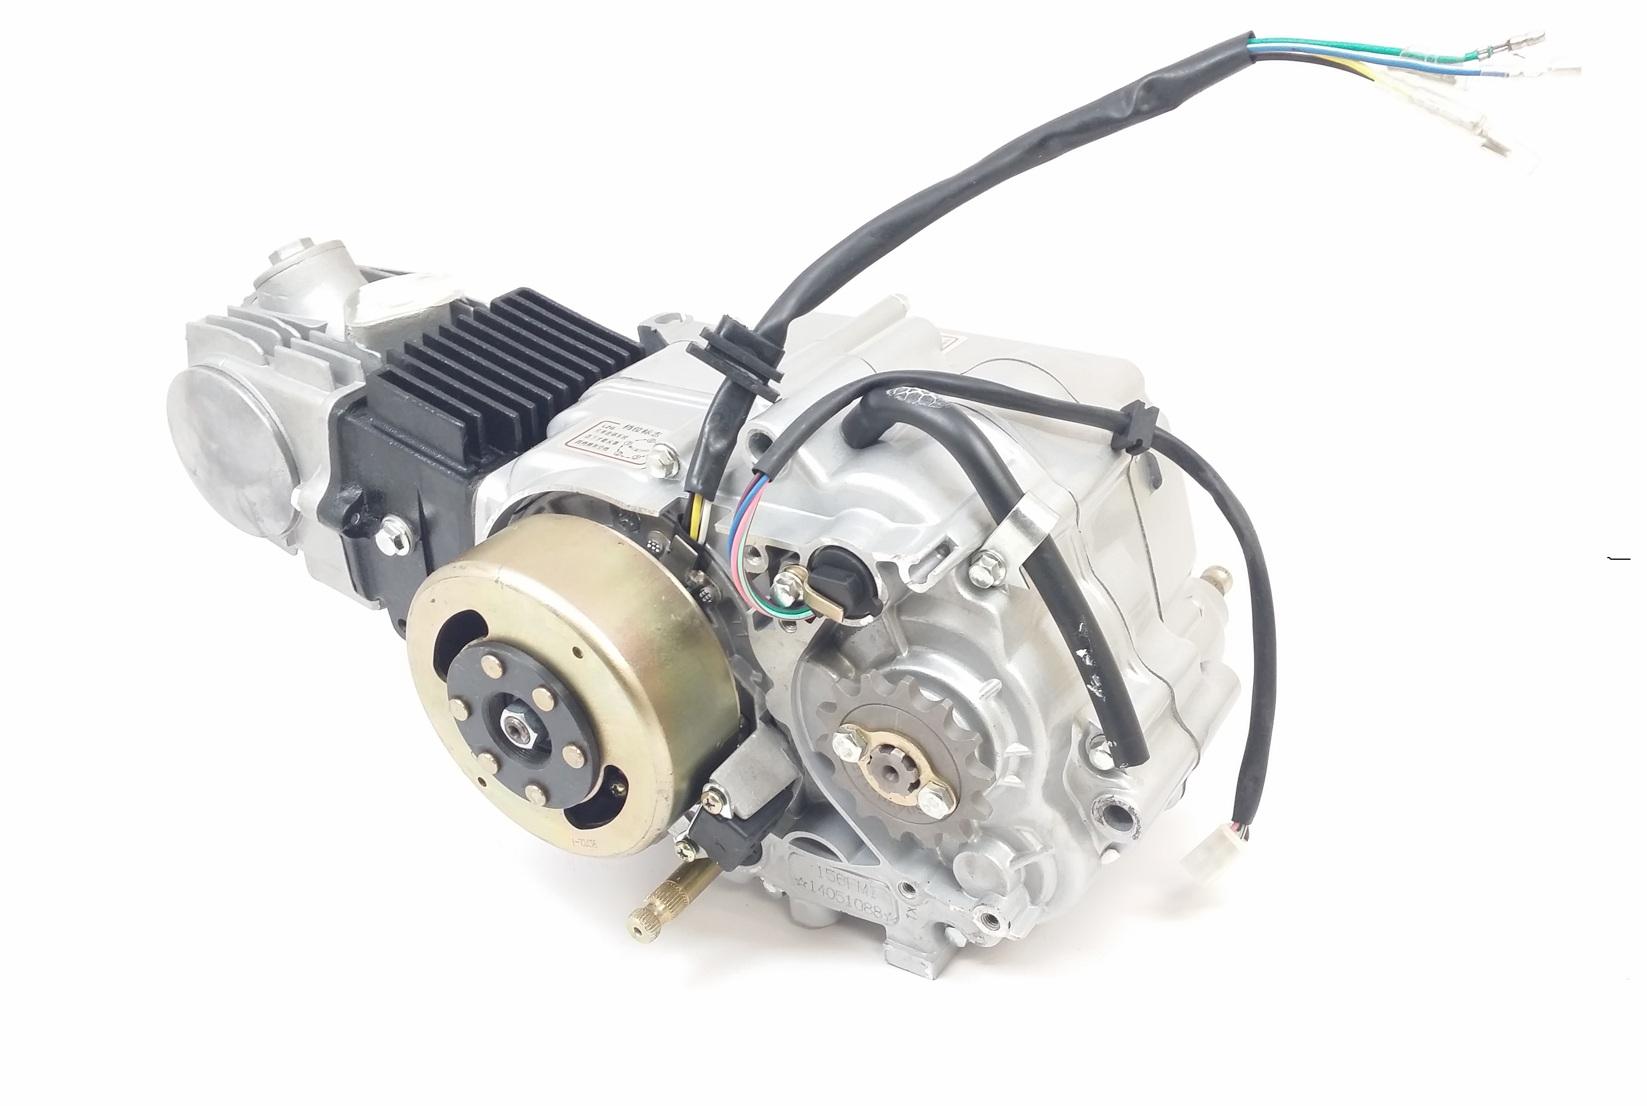 Engine - Lifan 125cc Manual Clutch Dirt Bike